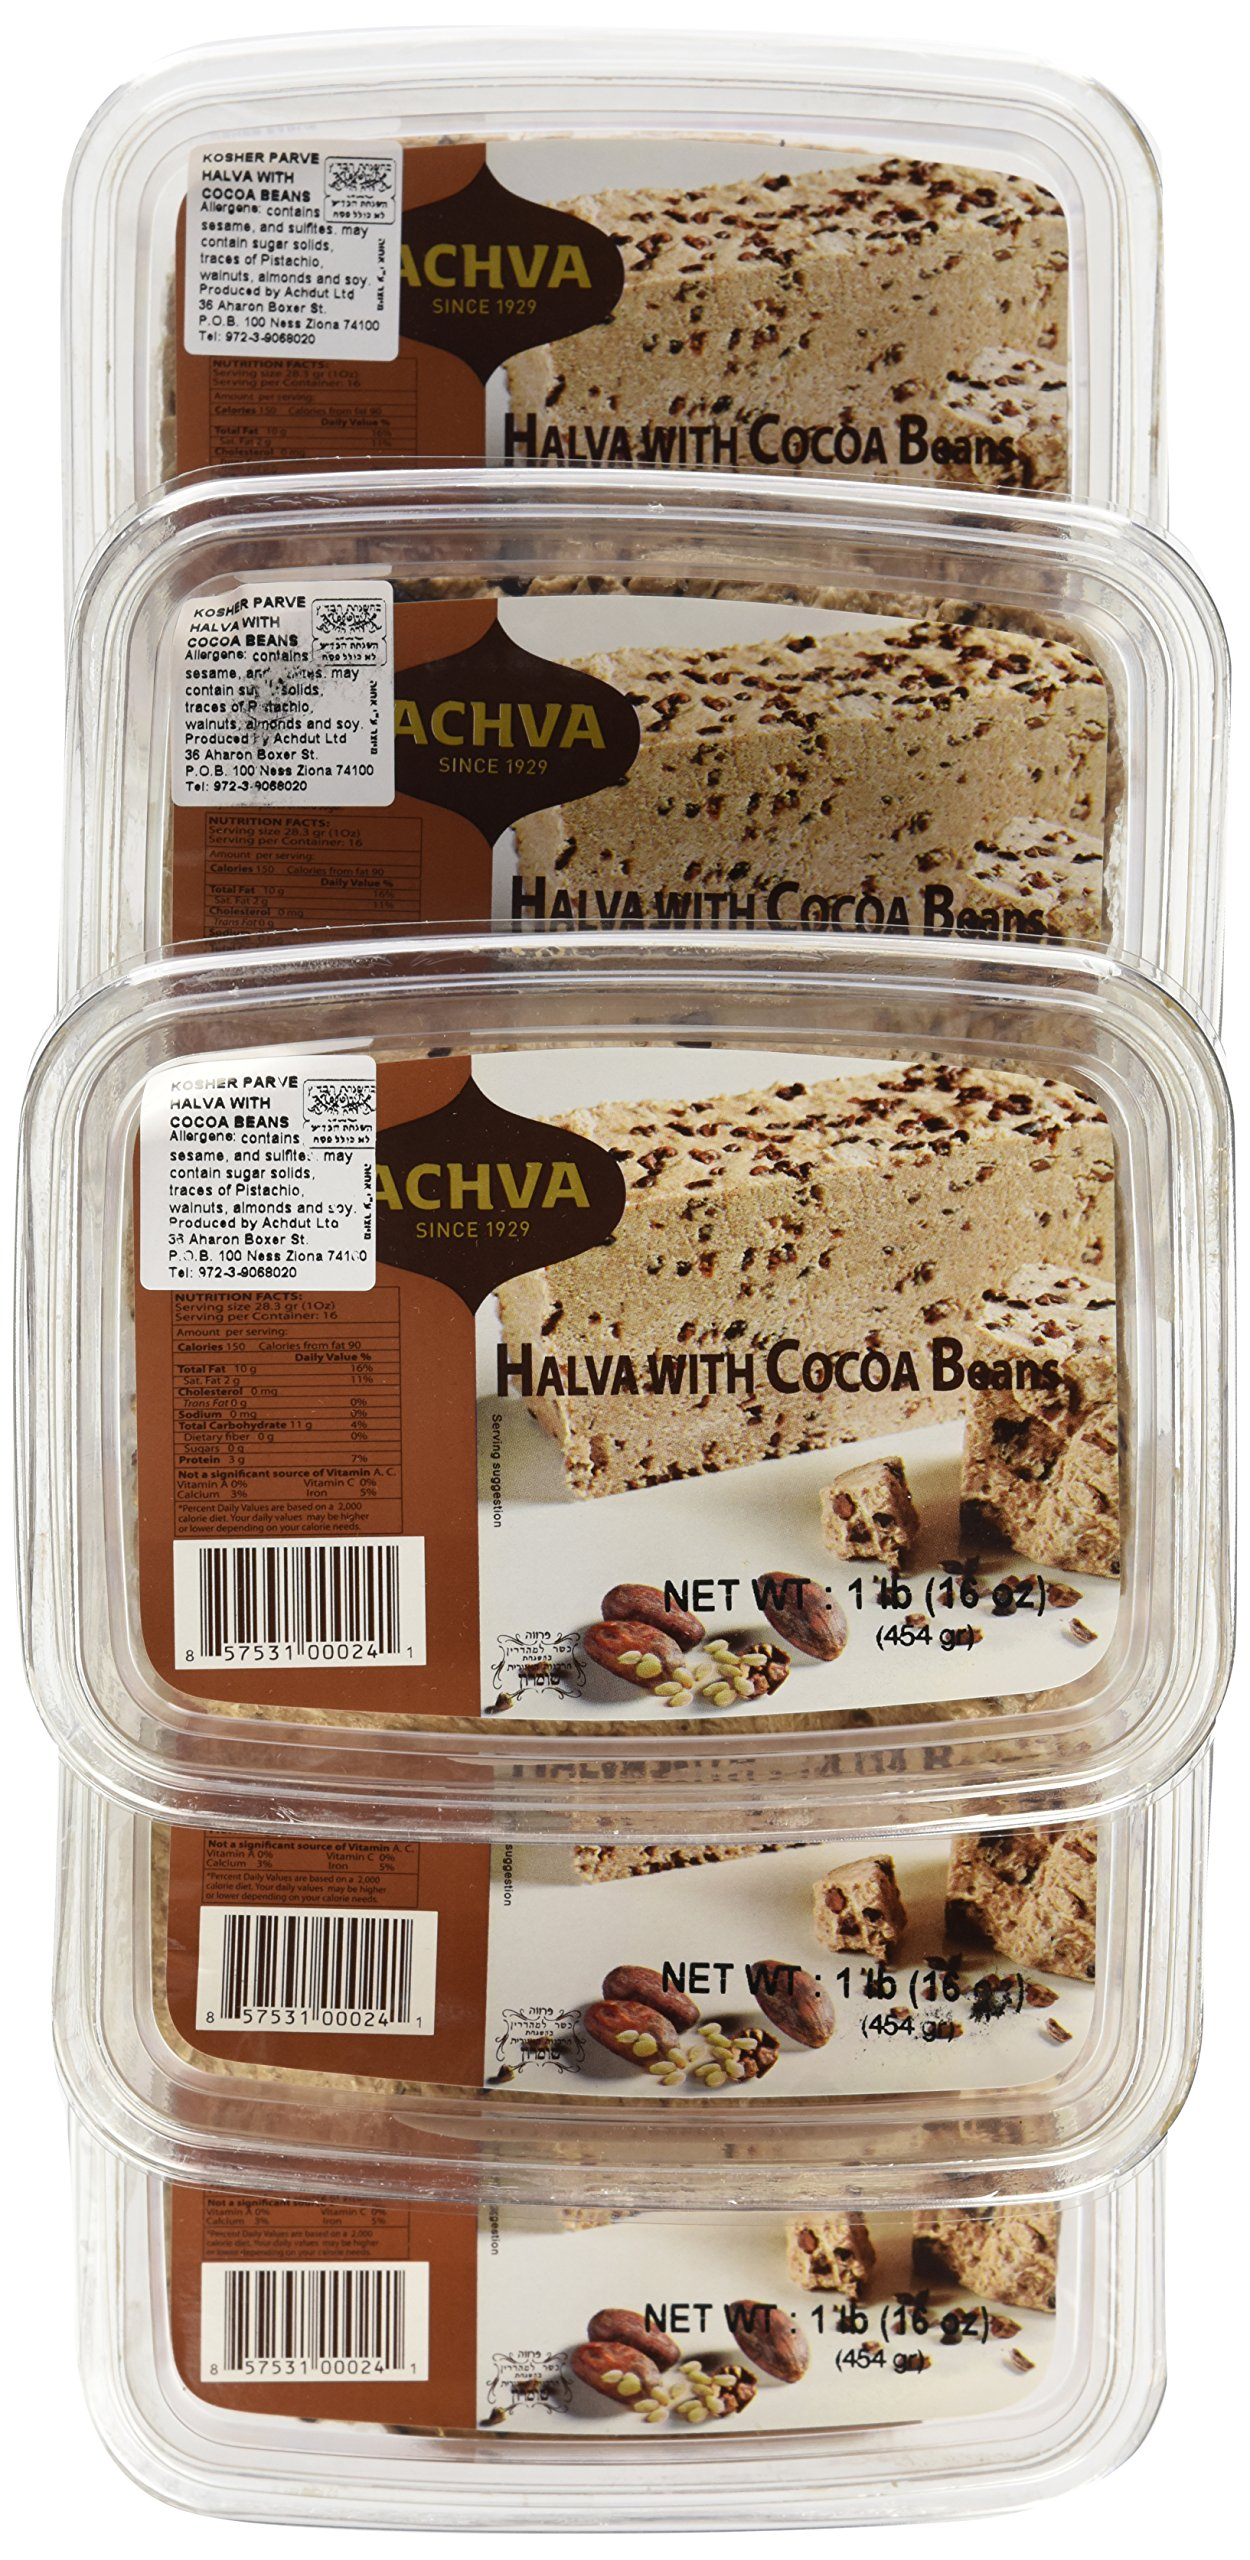 Achva Halva, Cocoa Beans, 16-Ounce Trays (Pack of 12) by Achva